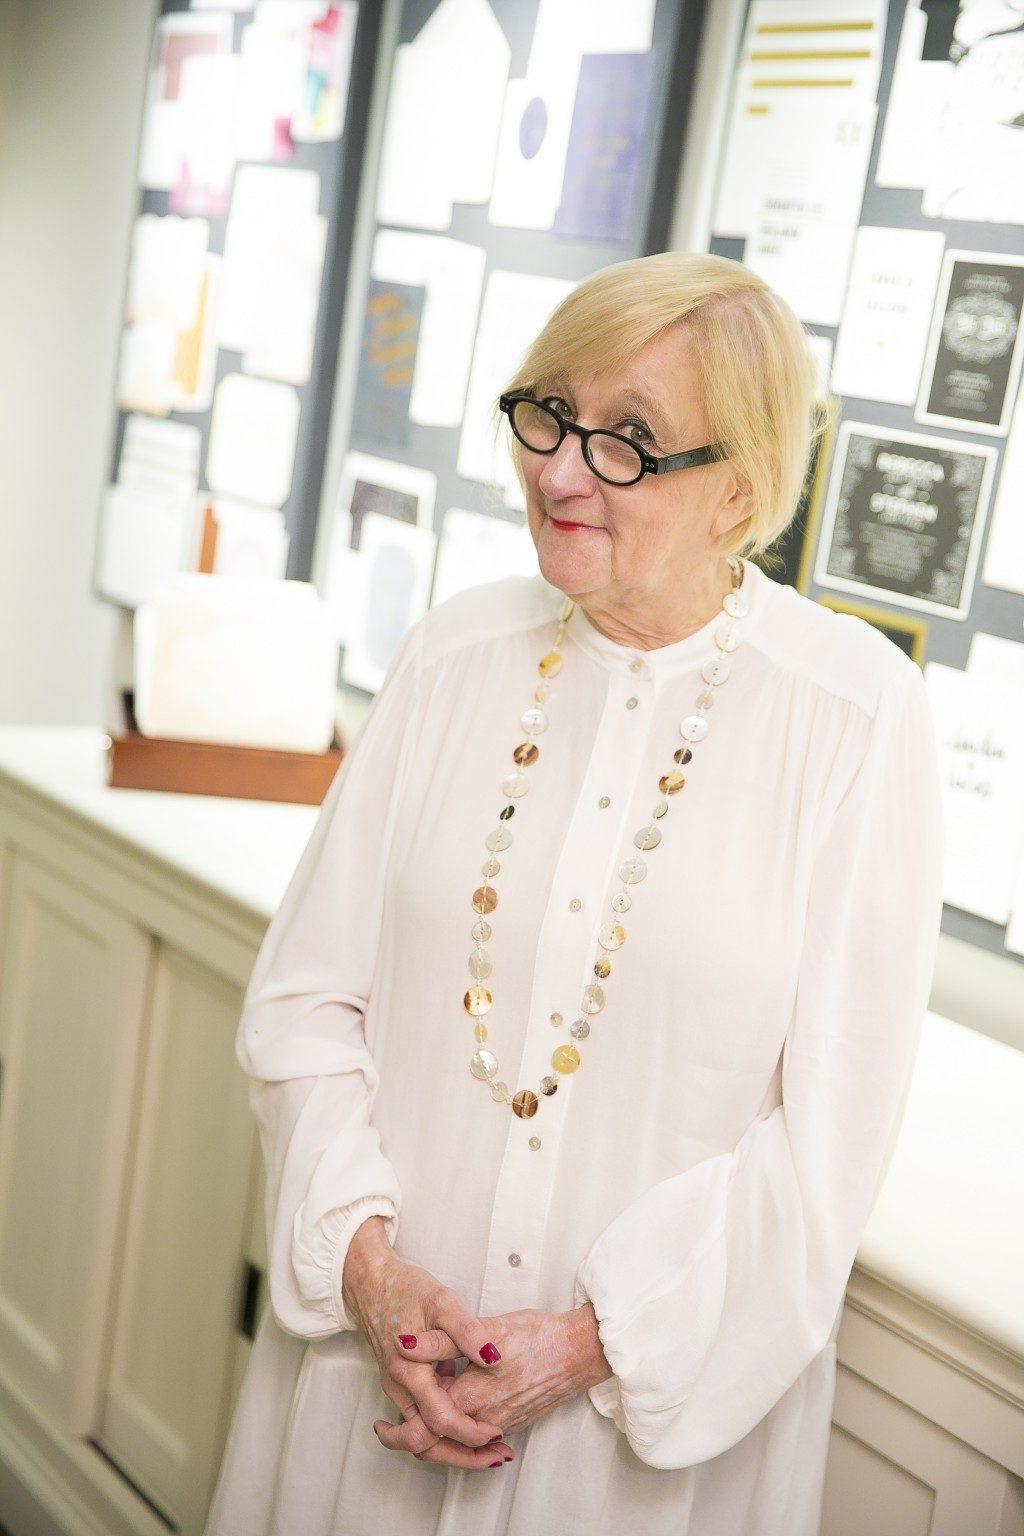 Bella Figura's flagship store manager, Linda Hays